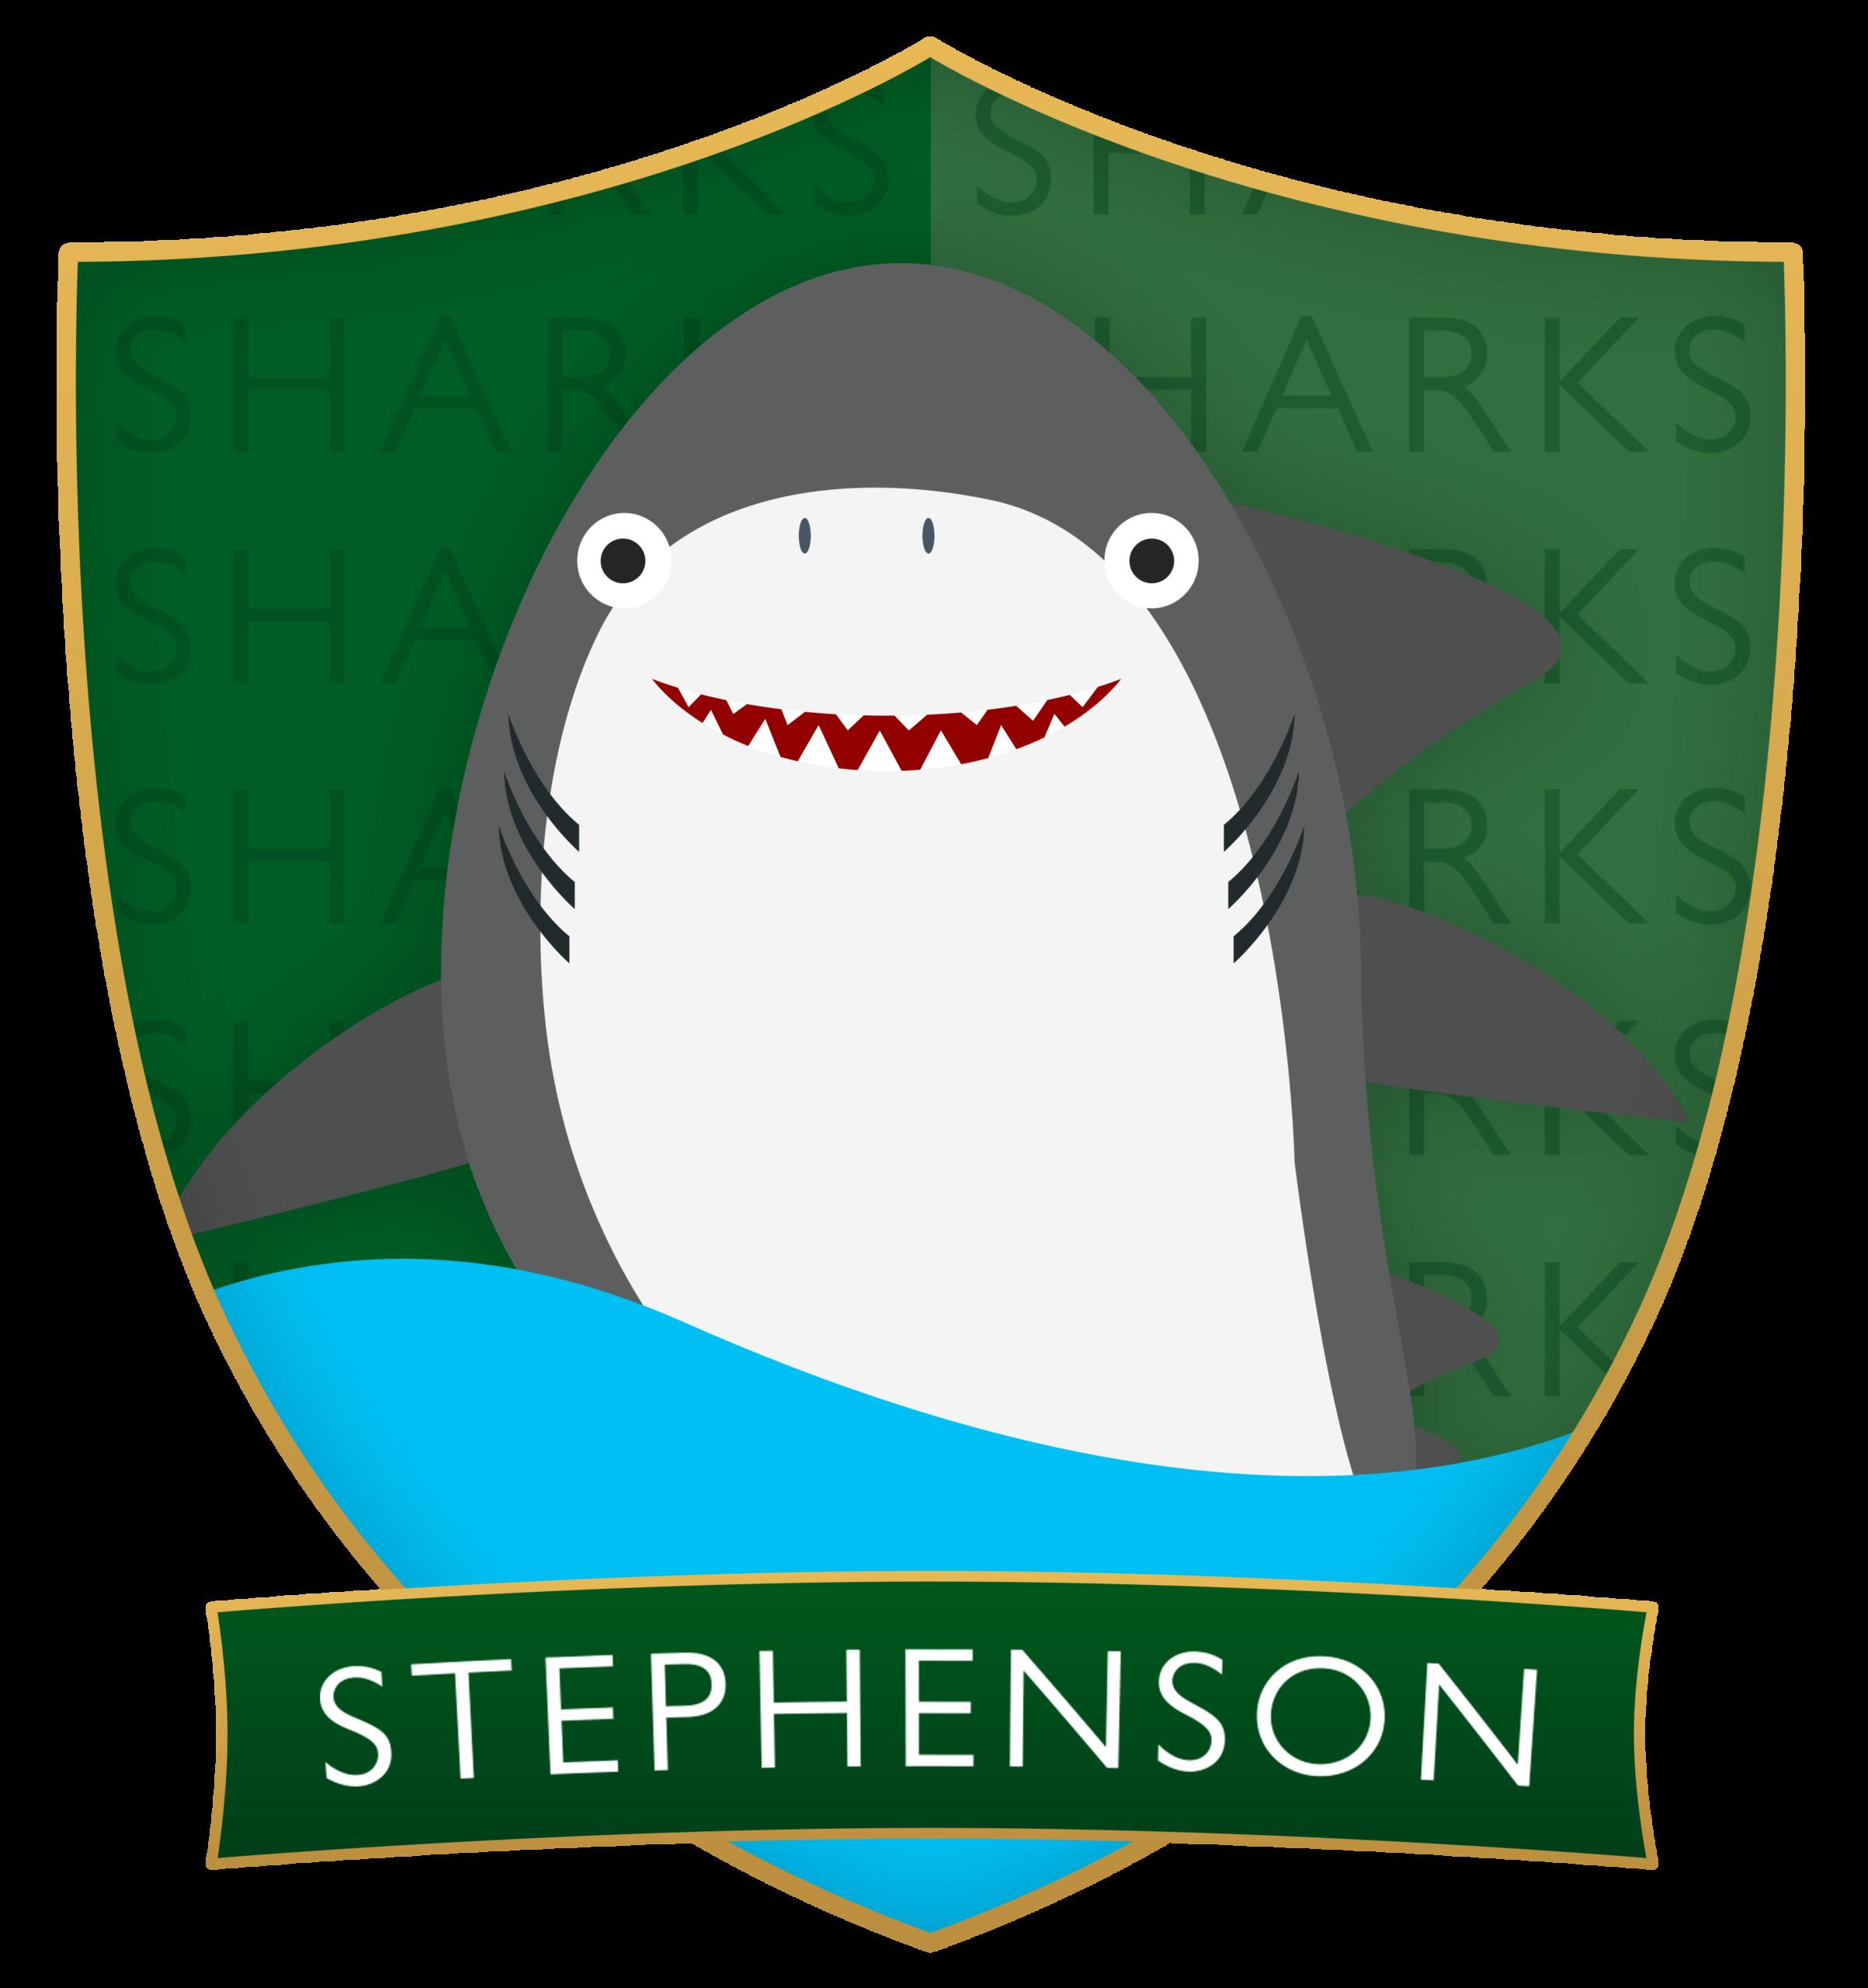 Stephenson-Sharks